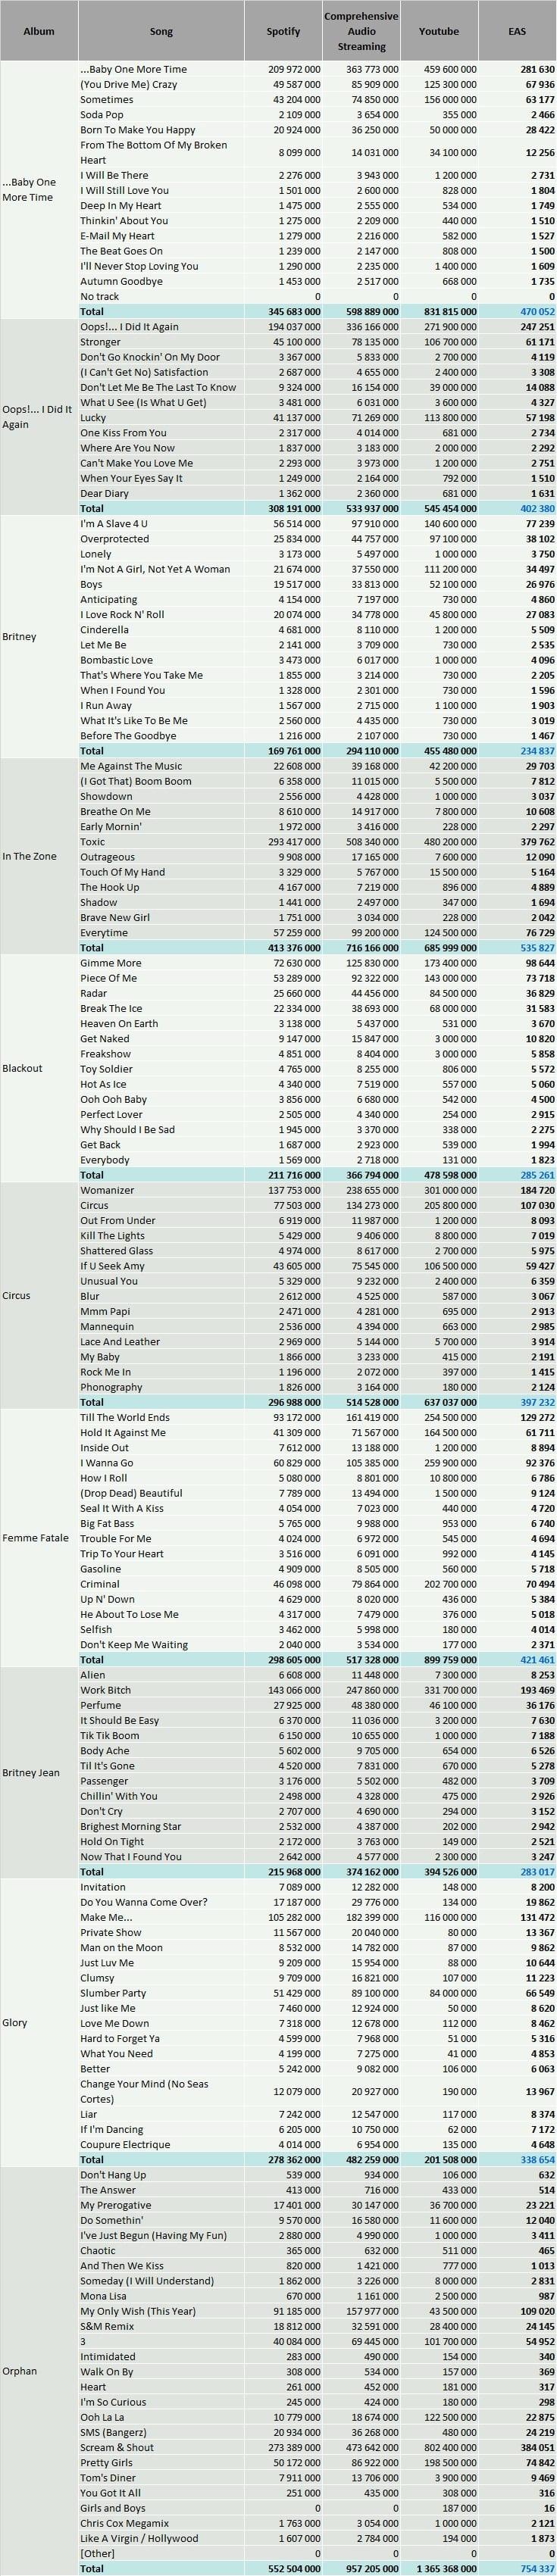 Britney Spears streaming statistics